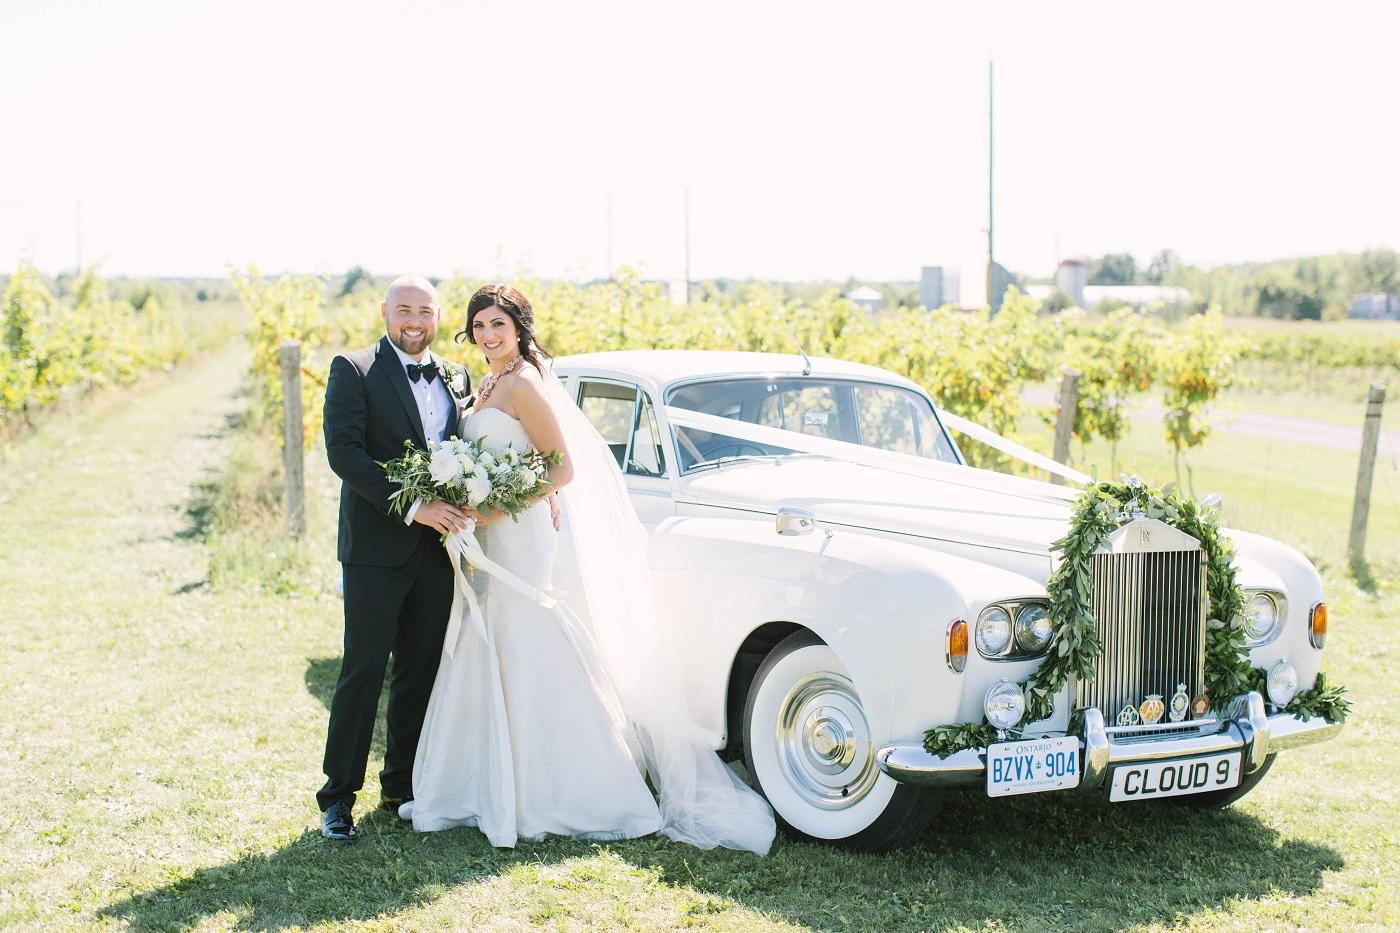 liuna-gardens-wedding-hamilton-kj-and-co-7.JPG